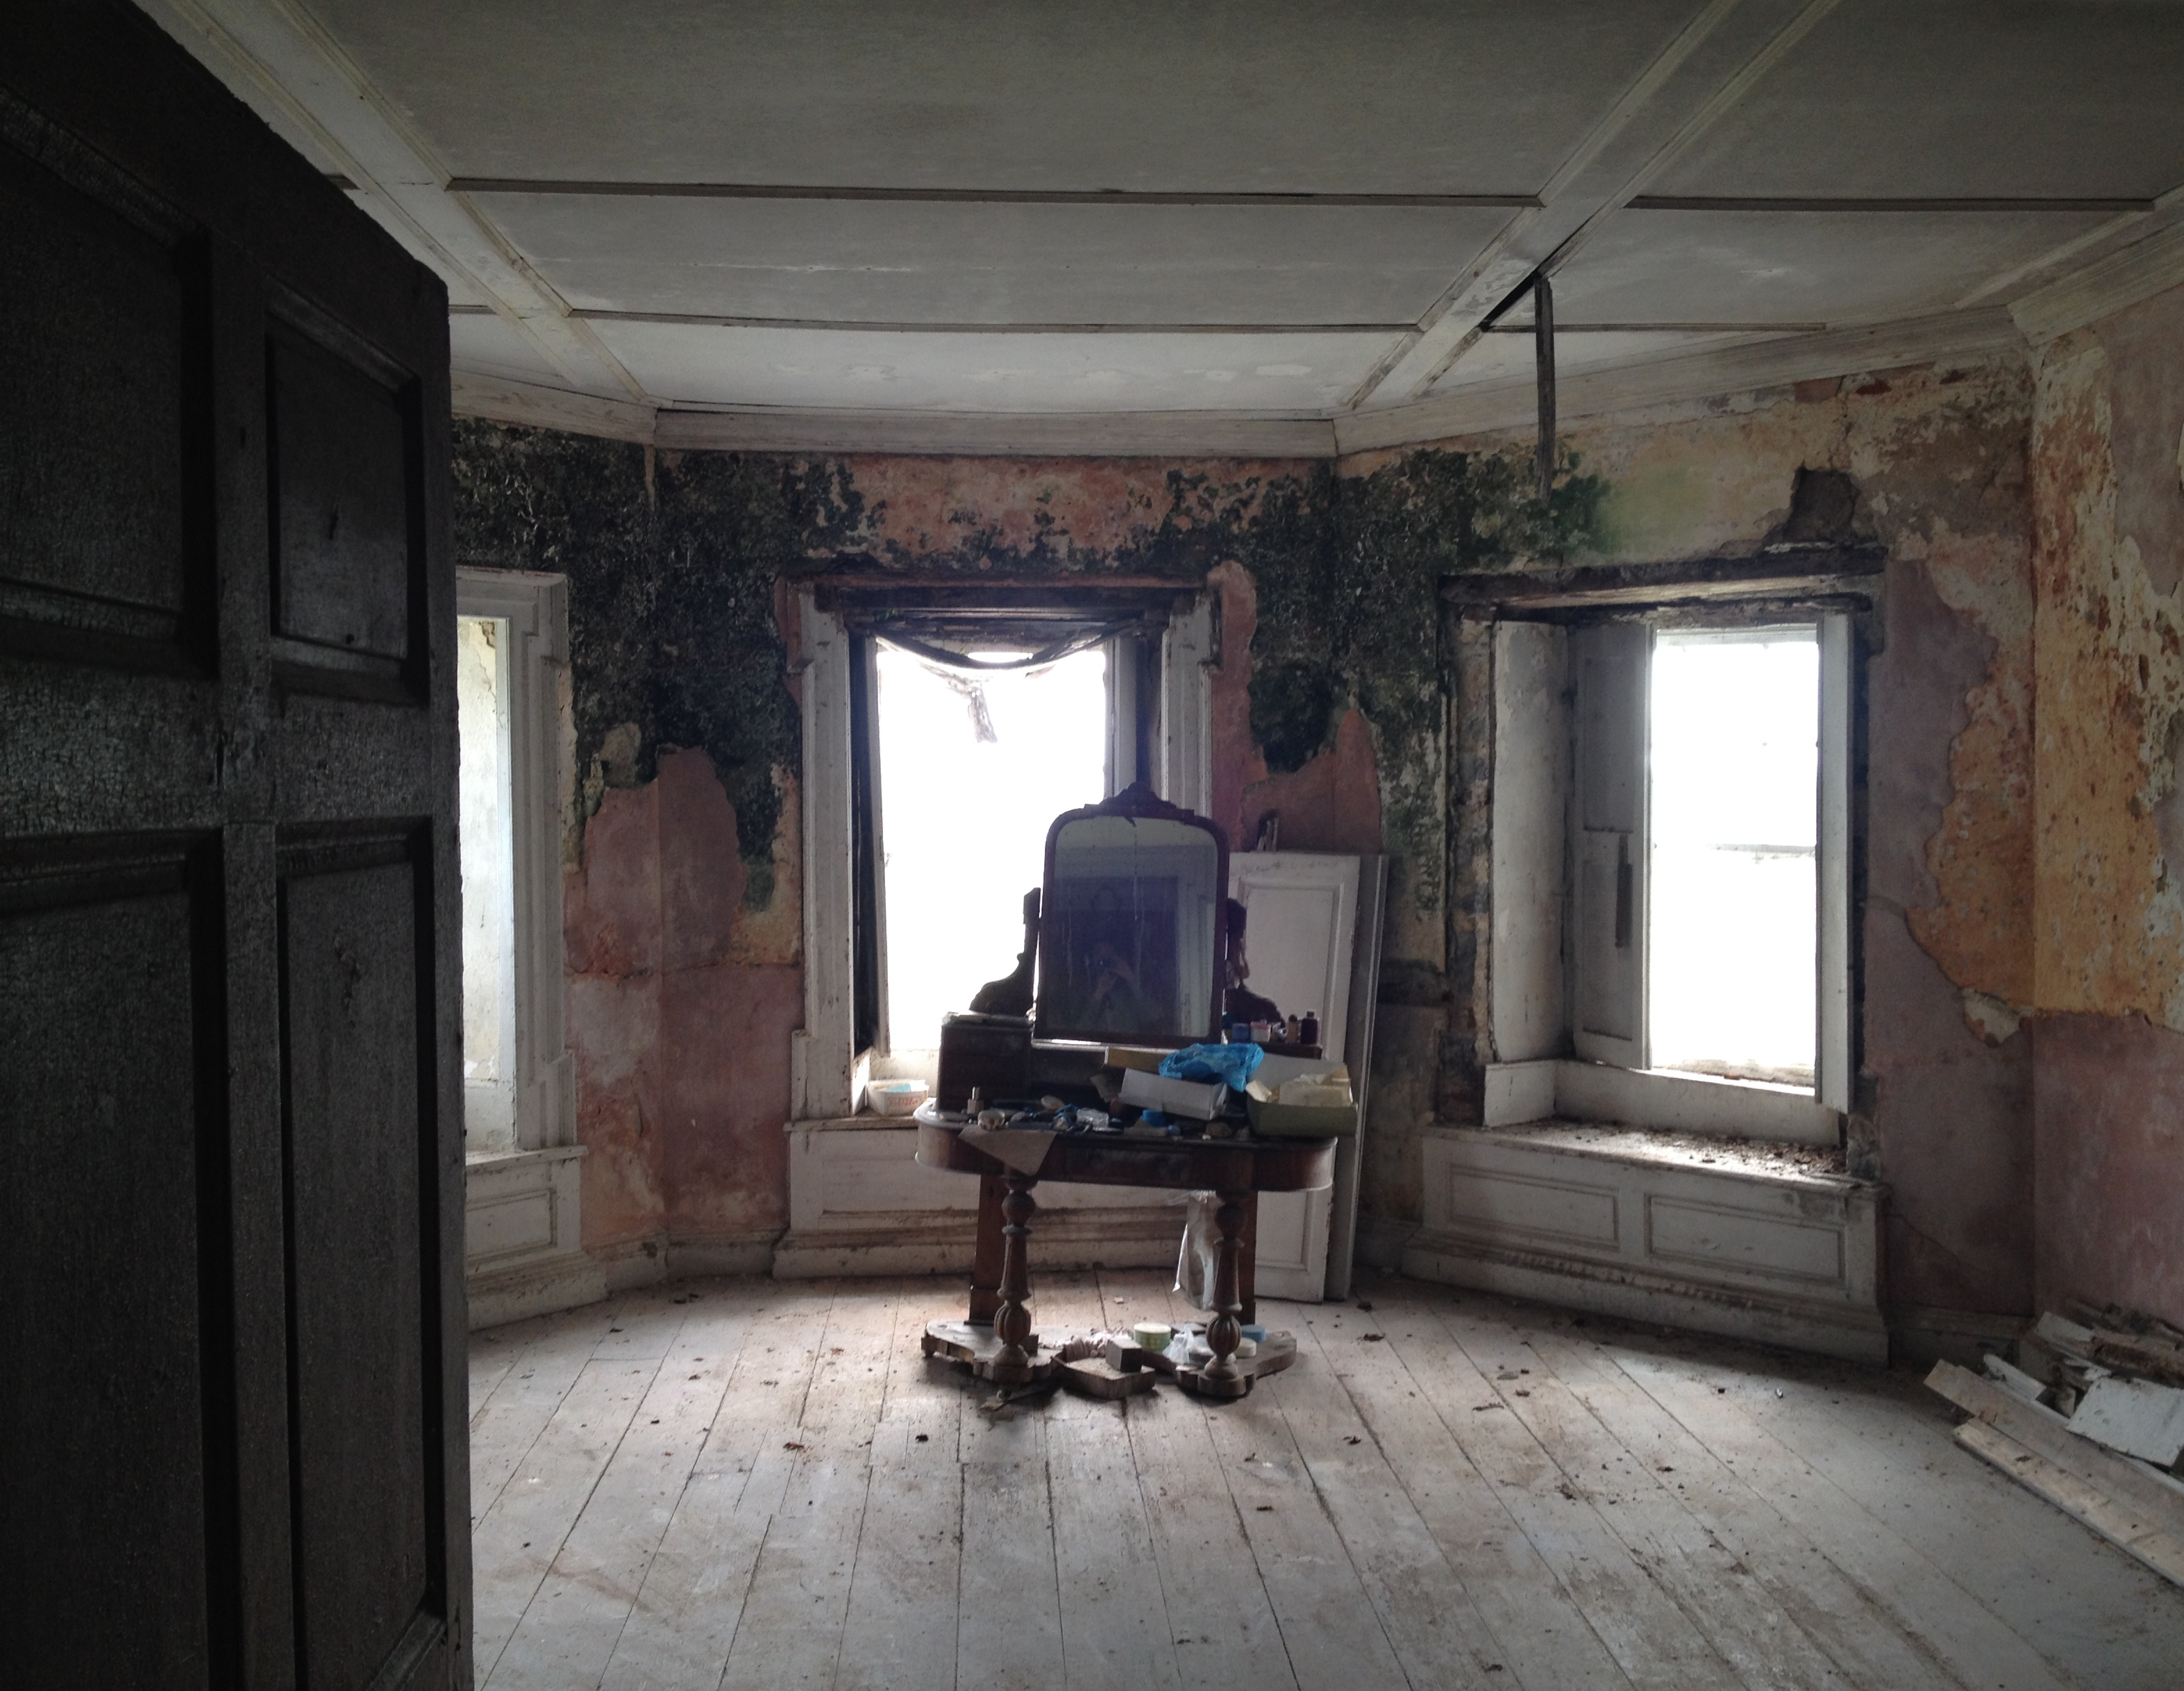 Leaving The Empty Room 171 The Irish Aesthete